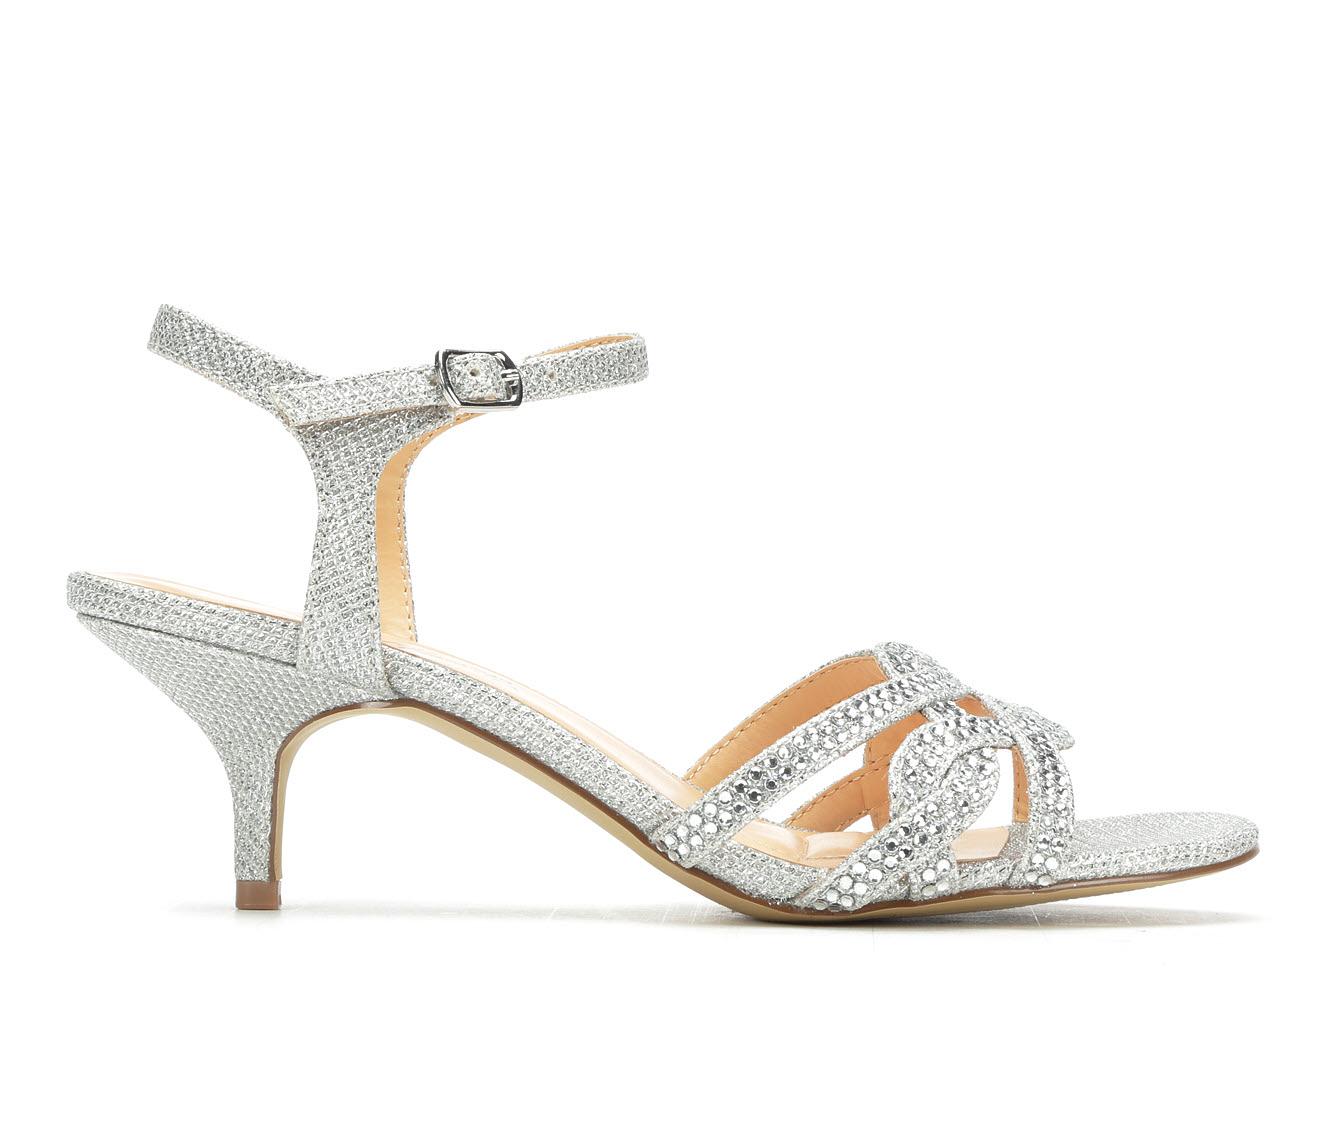 American Glamour BadgleyM Xabrina Women's Dress Shoe (Silver Canvas)